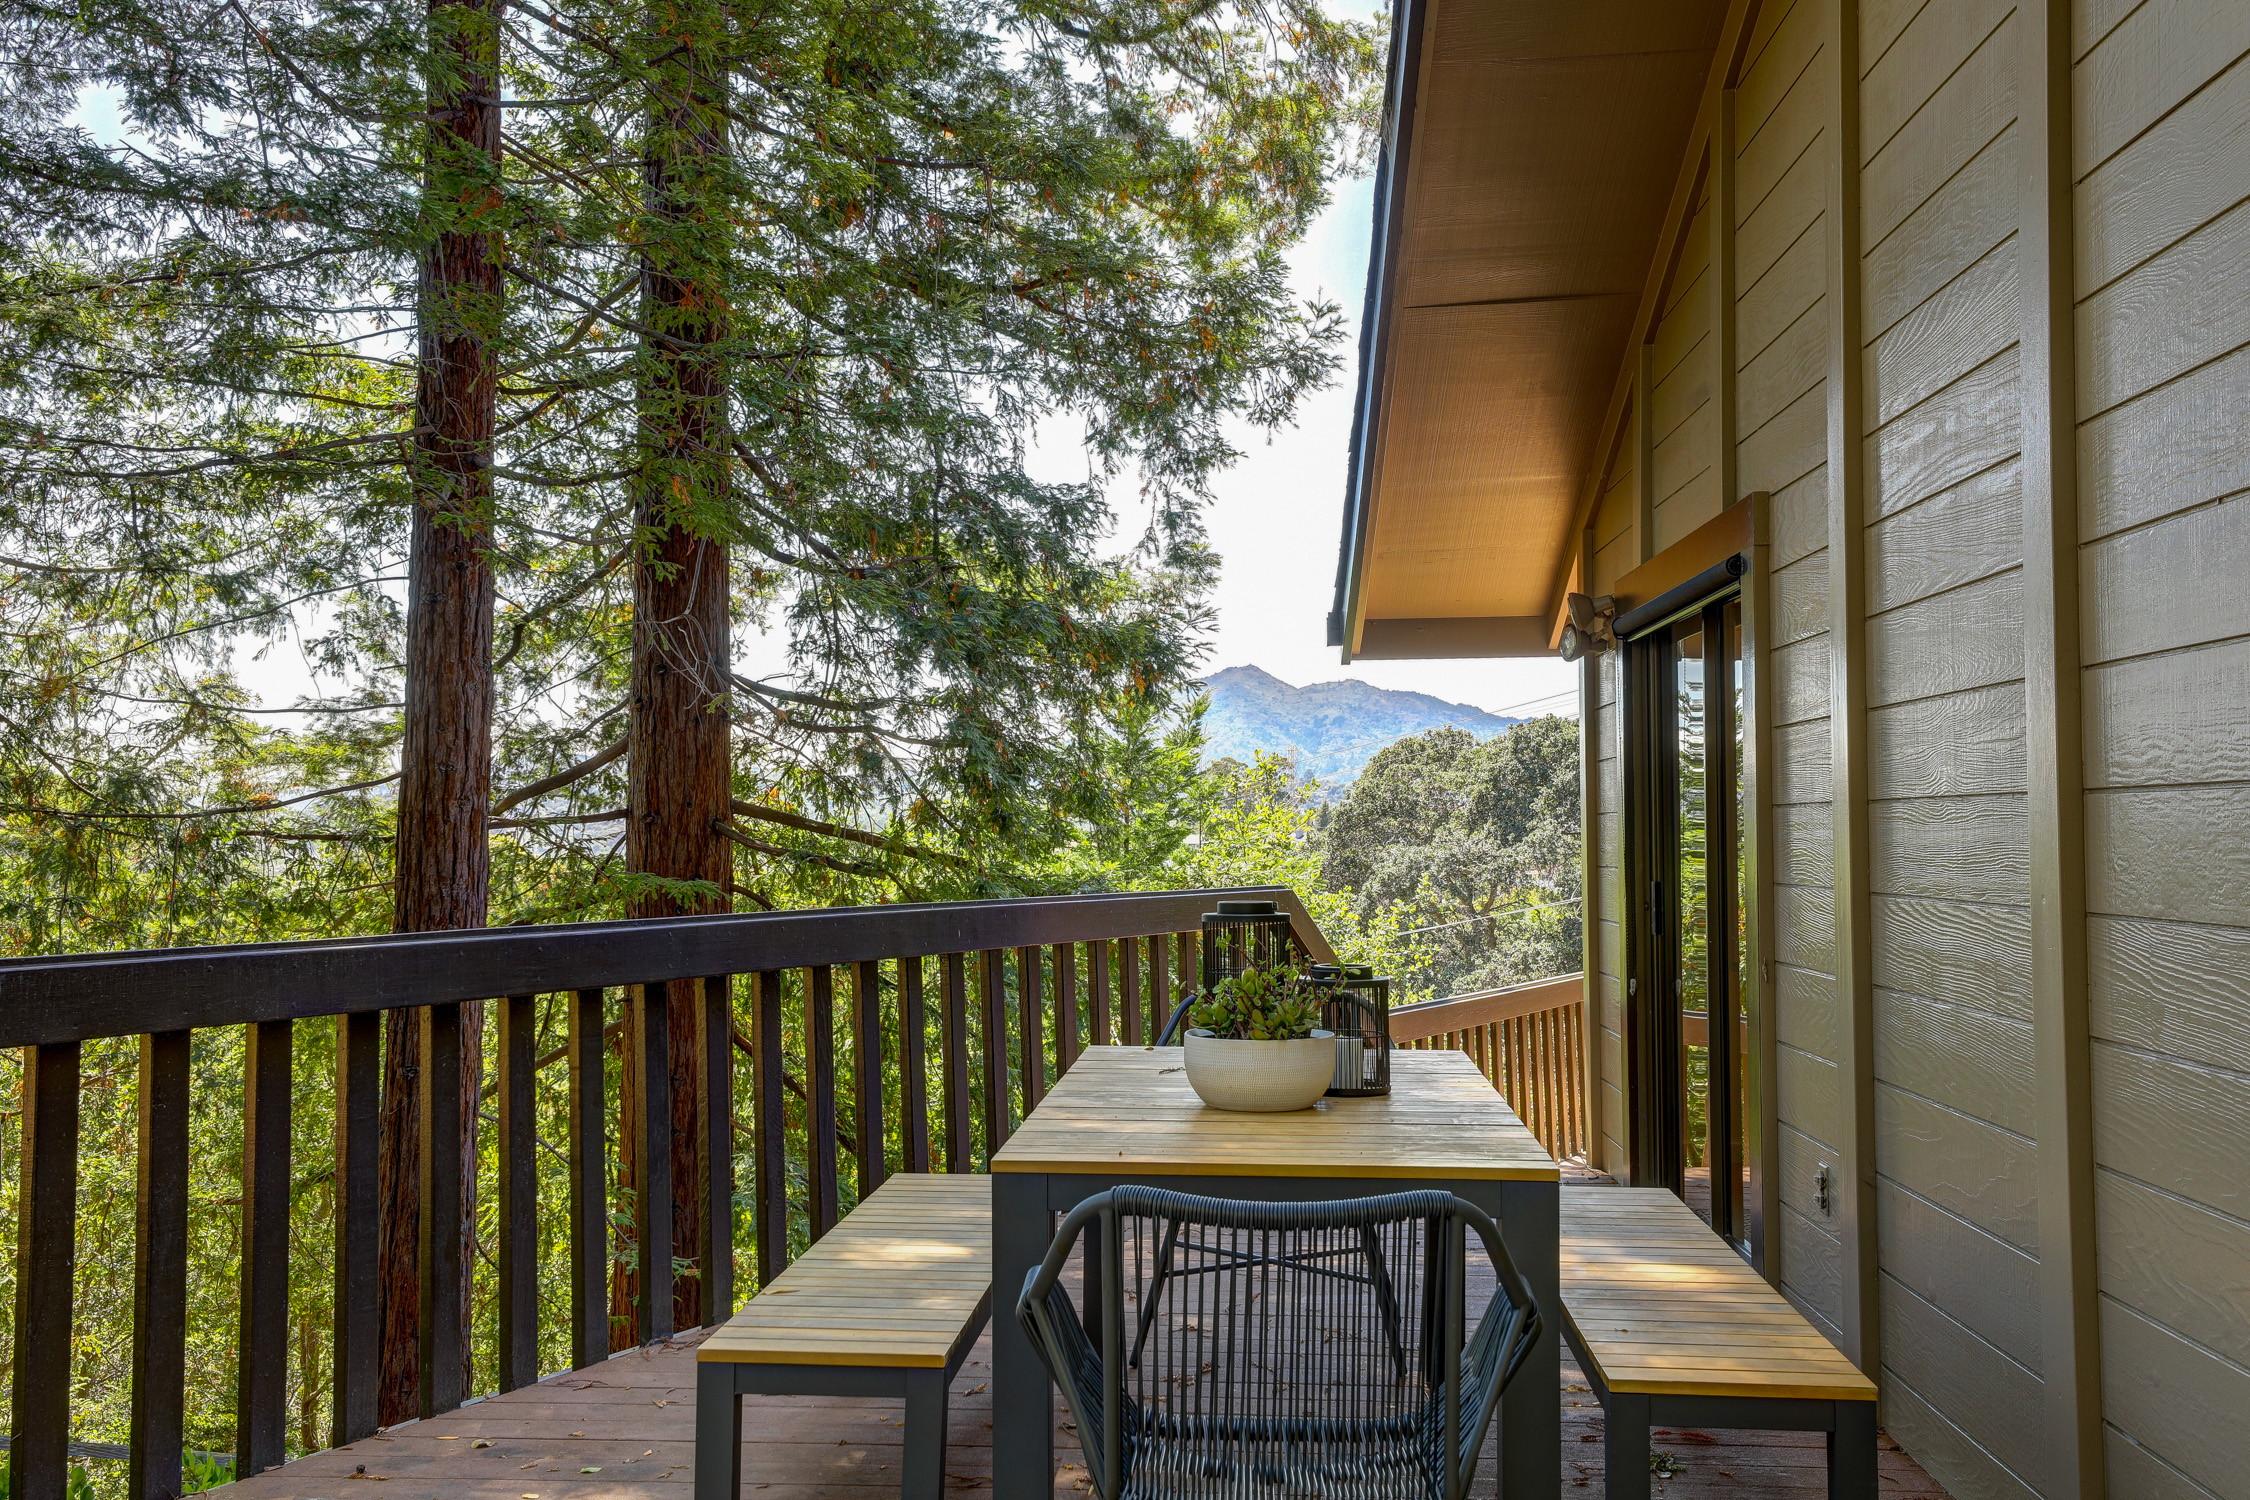 16Dorian 69 MLSSan Rafael Real Estate - Listed by Julia Fitzpatrick + Allie Fornesi Team Own Marin County .jpg